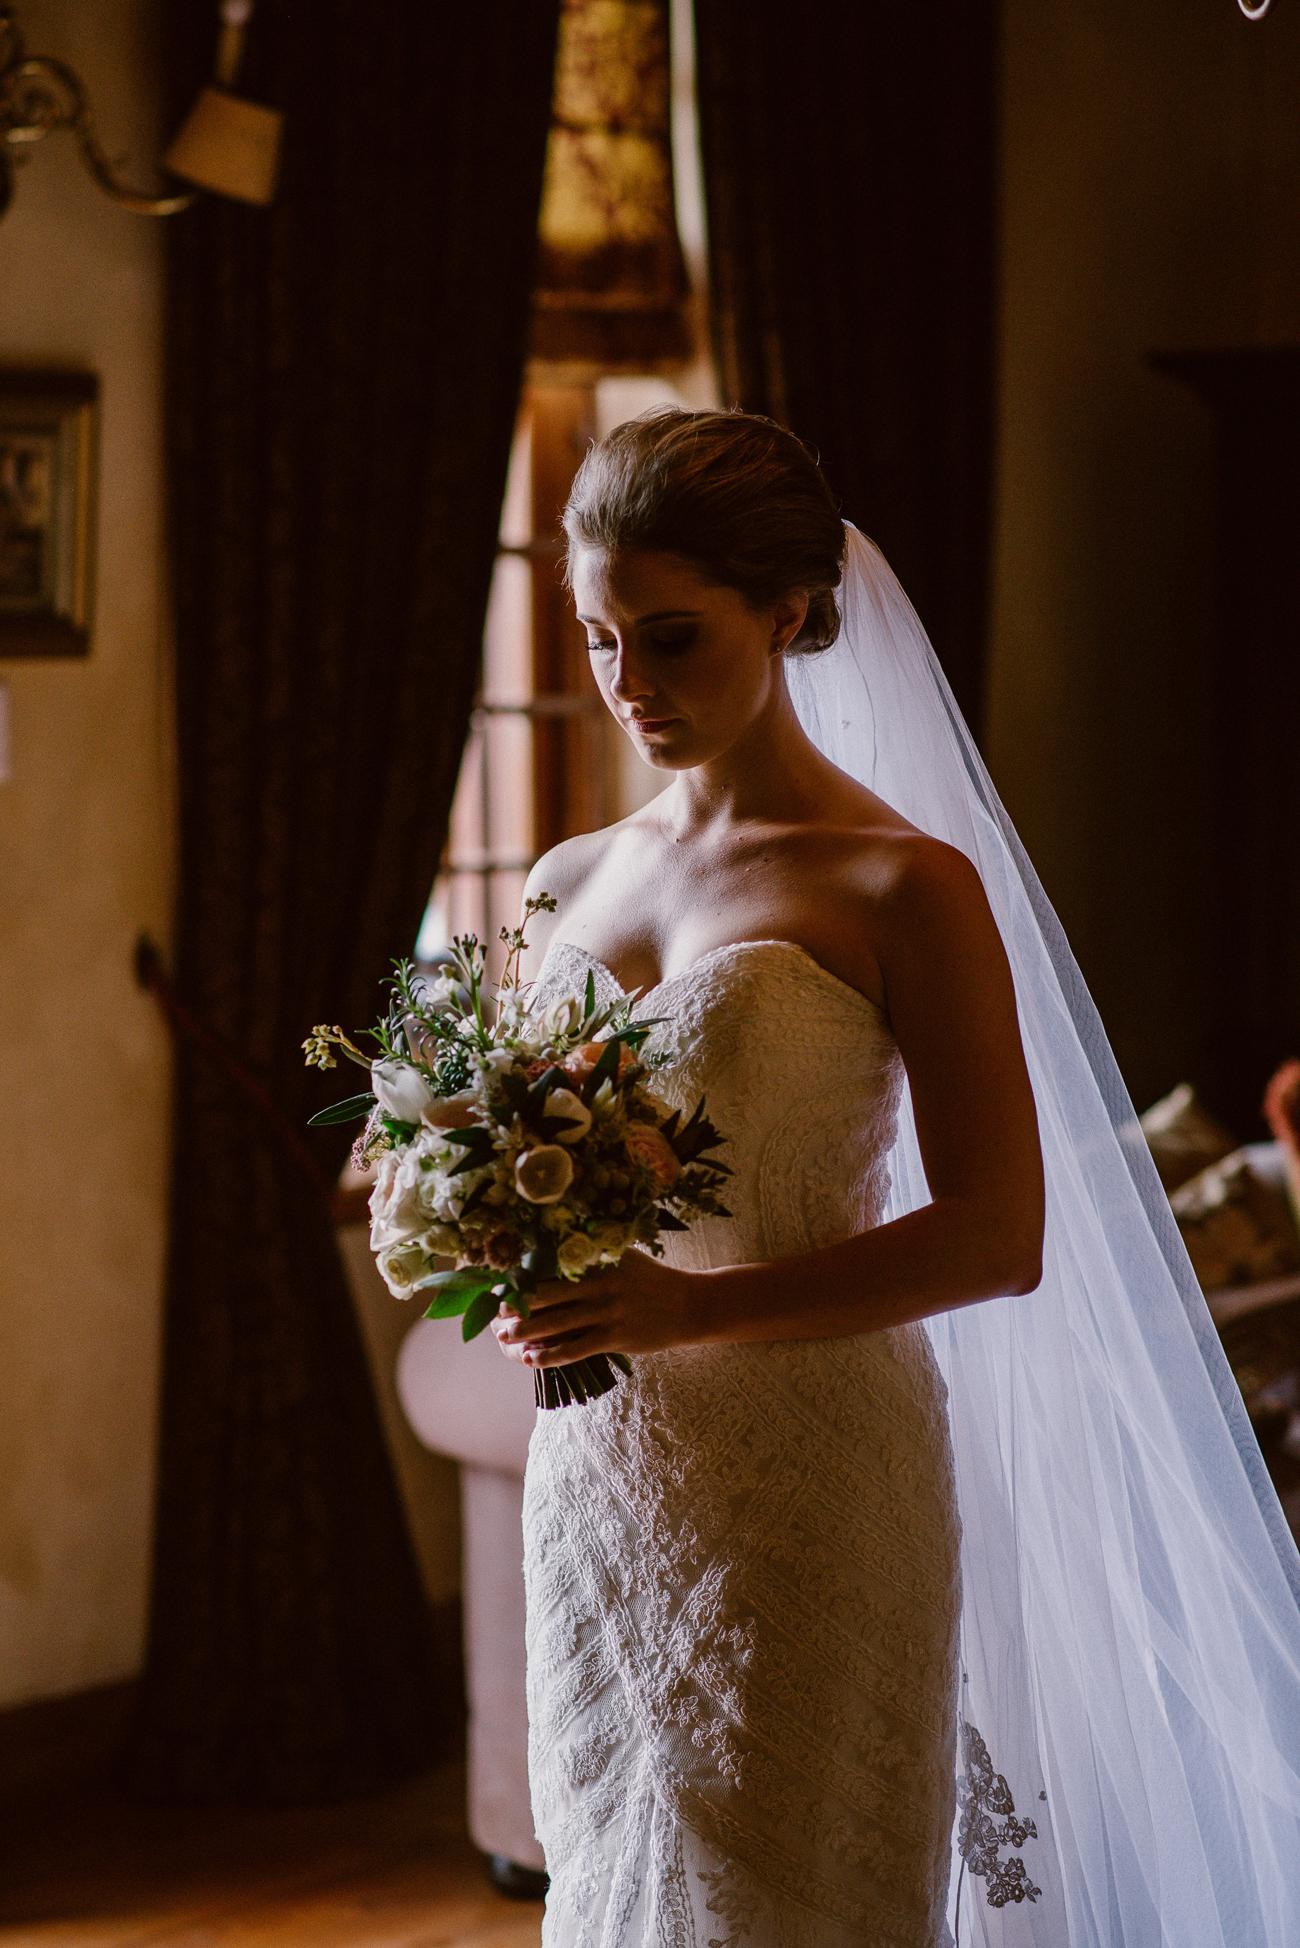 Bride in Heirloom Veil | Image: Lad & Lass Photography